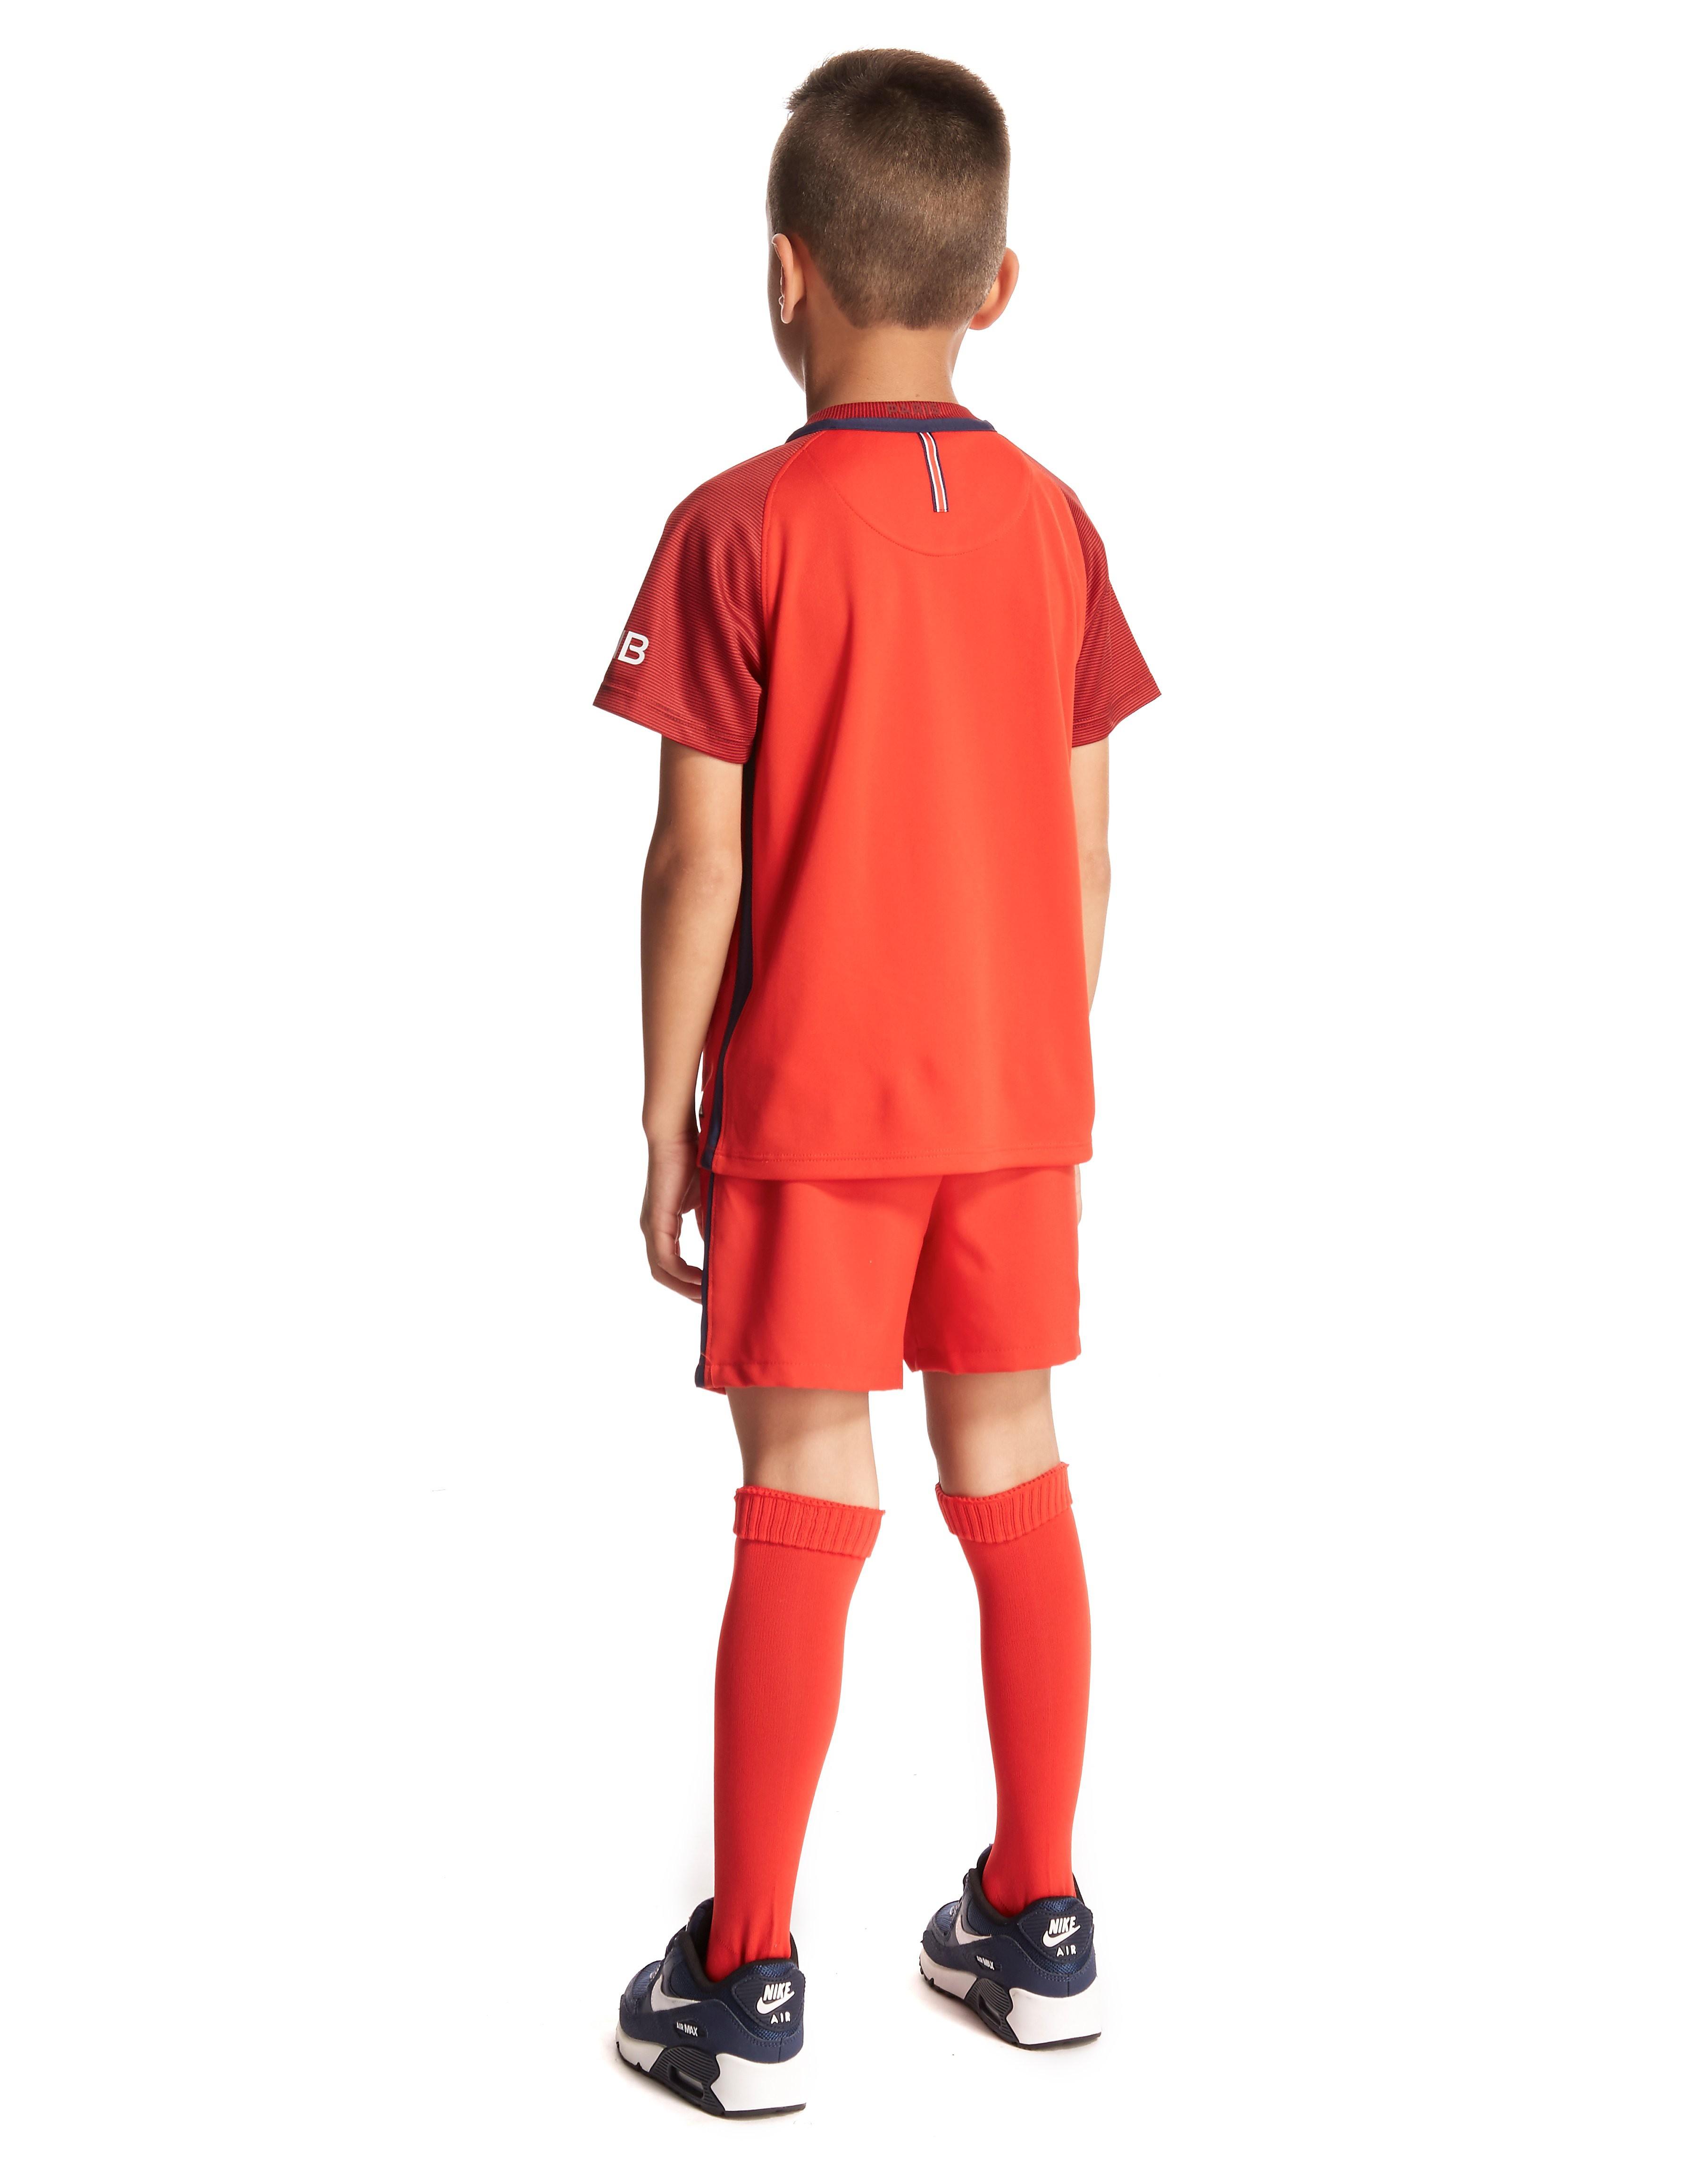 Nike Paris Saint Germain 2016/17 Away Kit Children